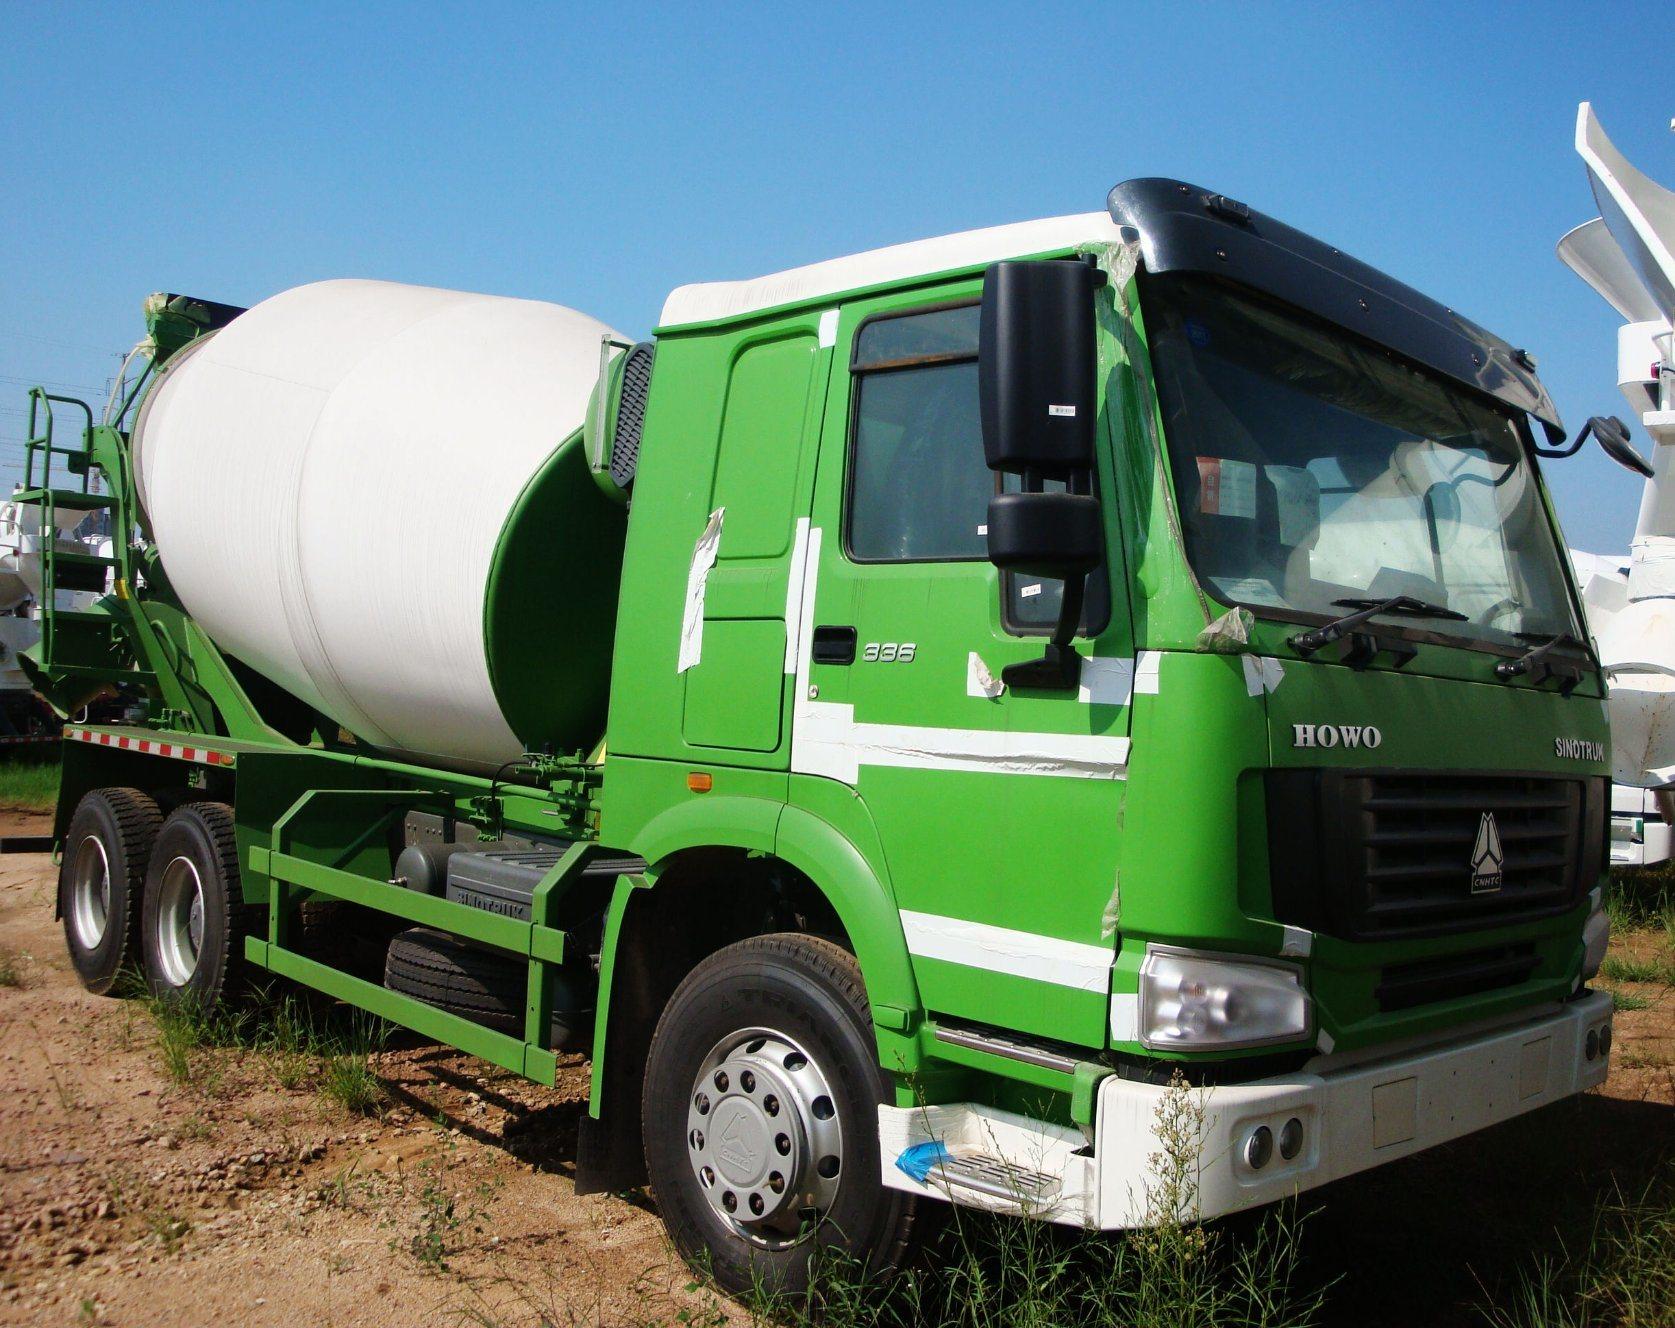 HOWO Concrete Mixer Truck for Construction